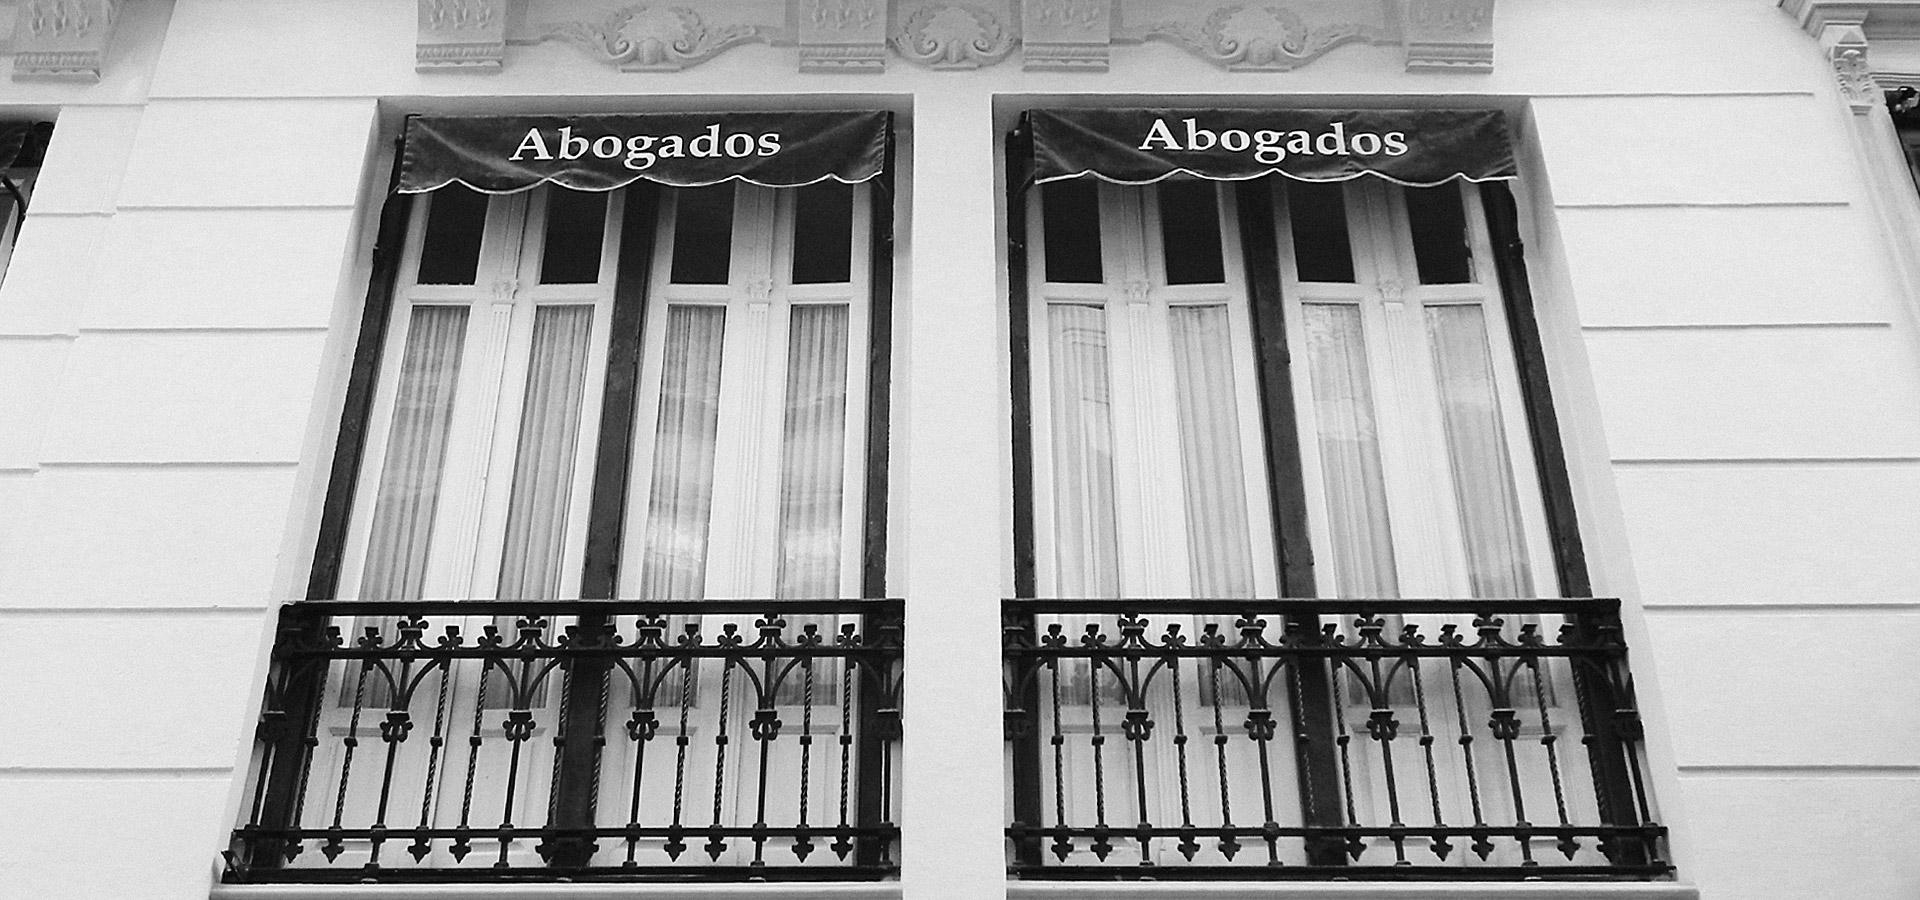 MartinSerrano_Abogados_Transparencia